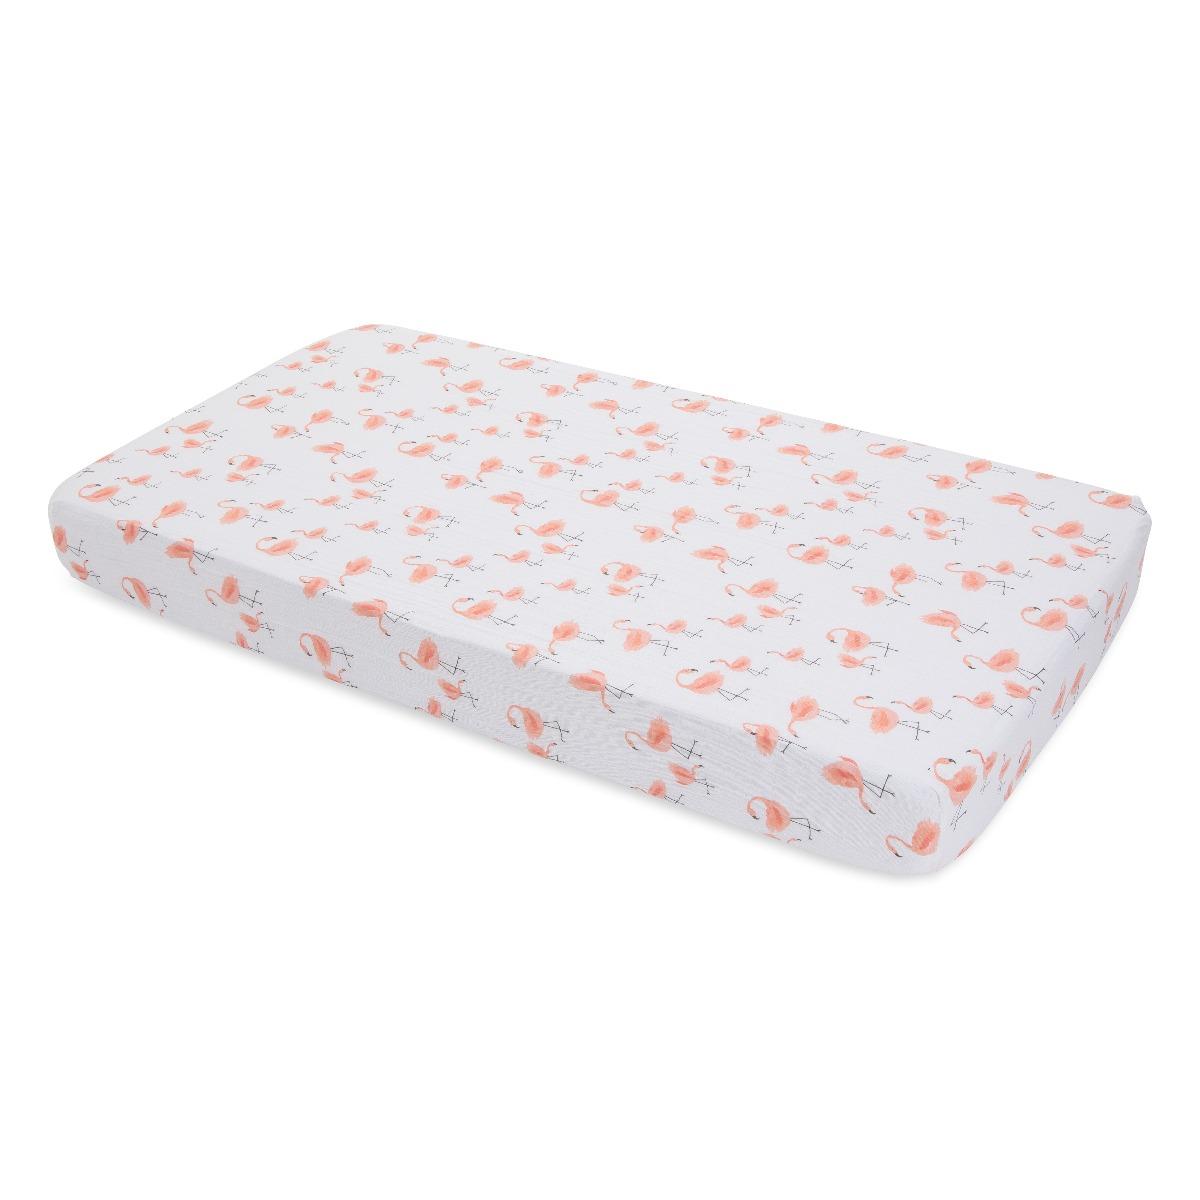 Little Unicorn Cotton Muslin Crib Sheet Pink Ladies